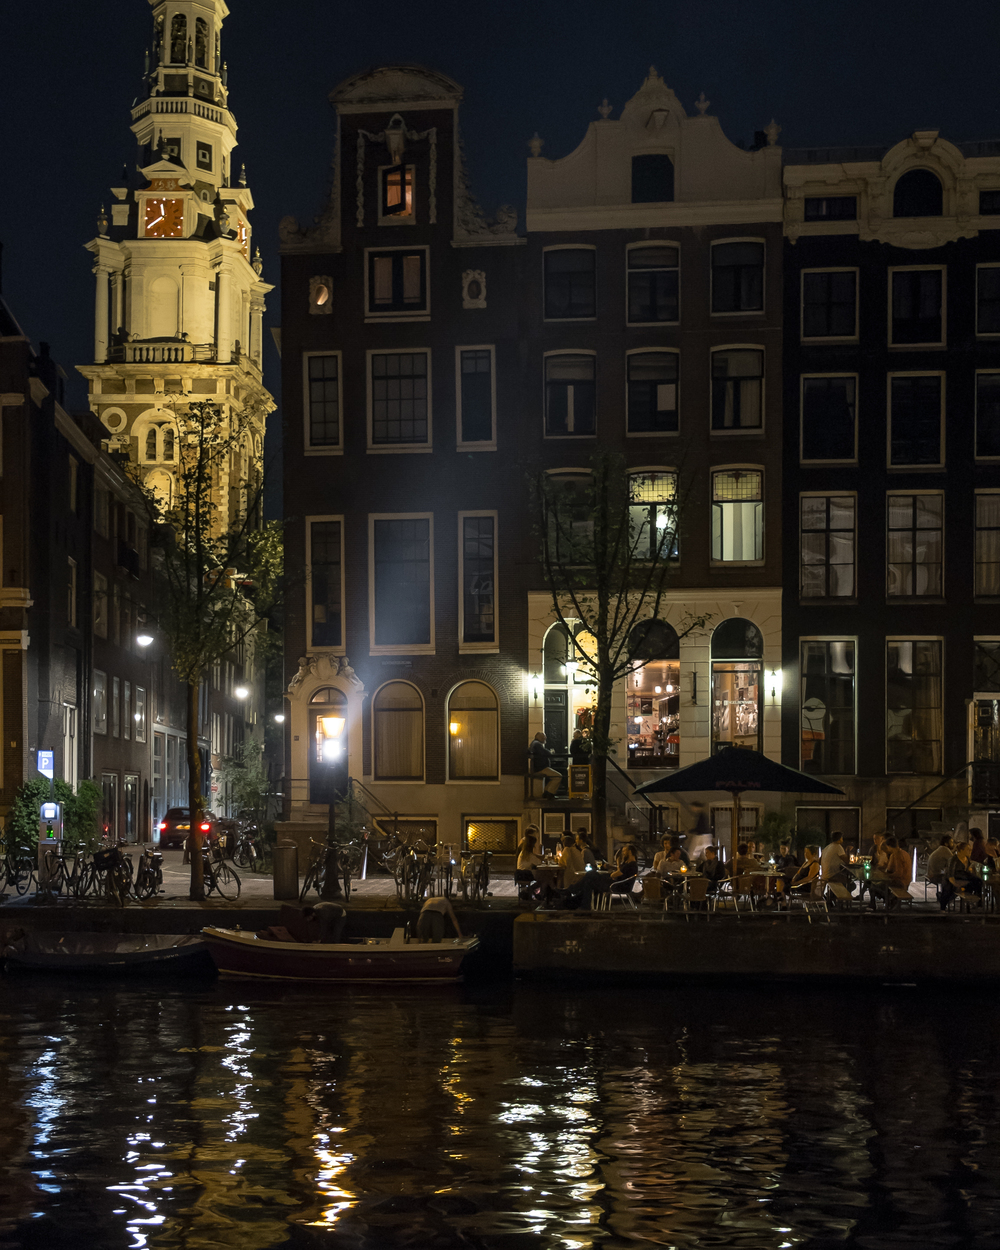 Amsterdam-1140pm20130618-DSCF0703.jpg